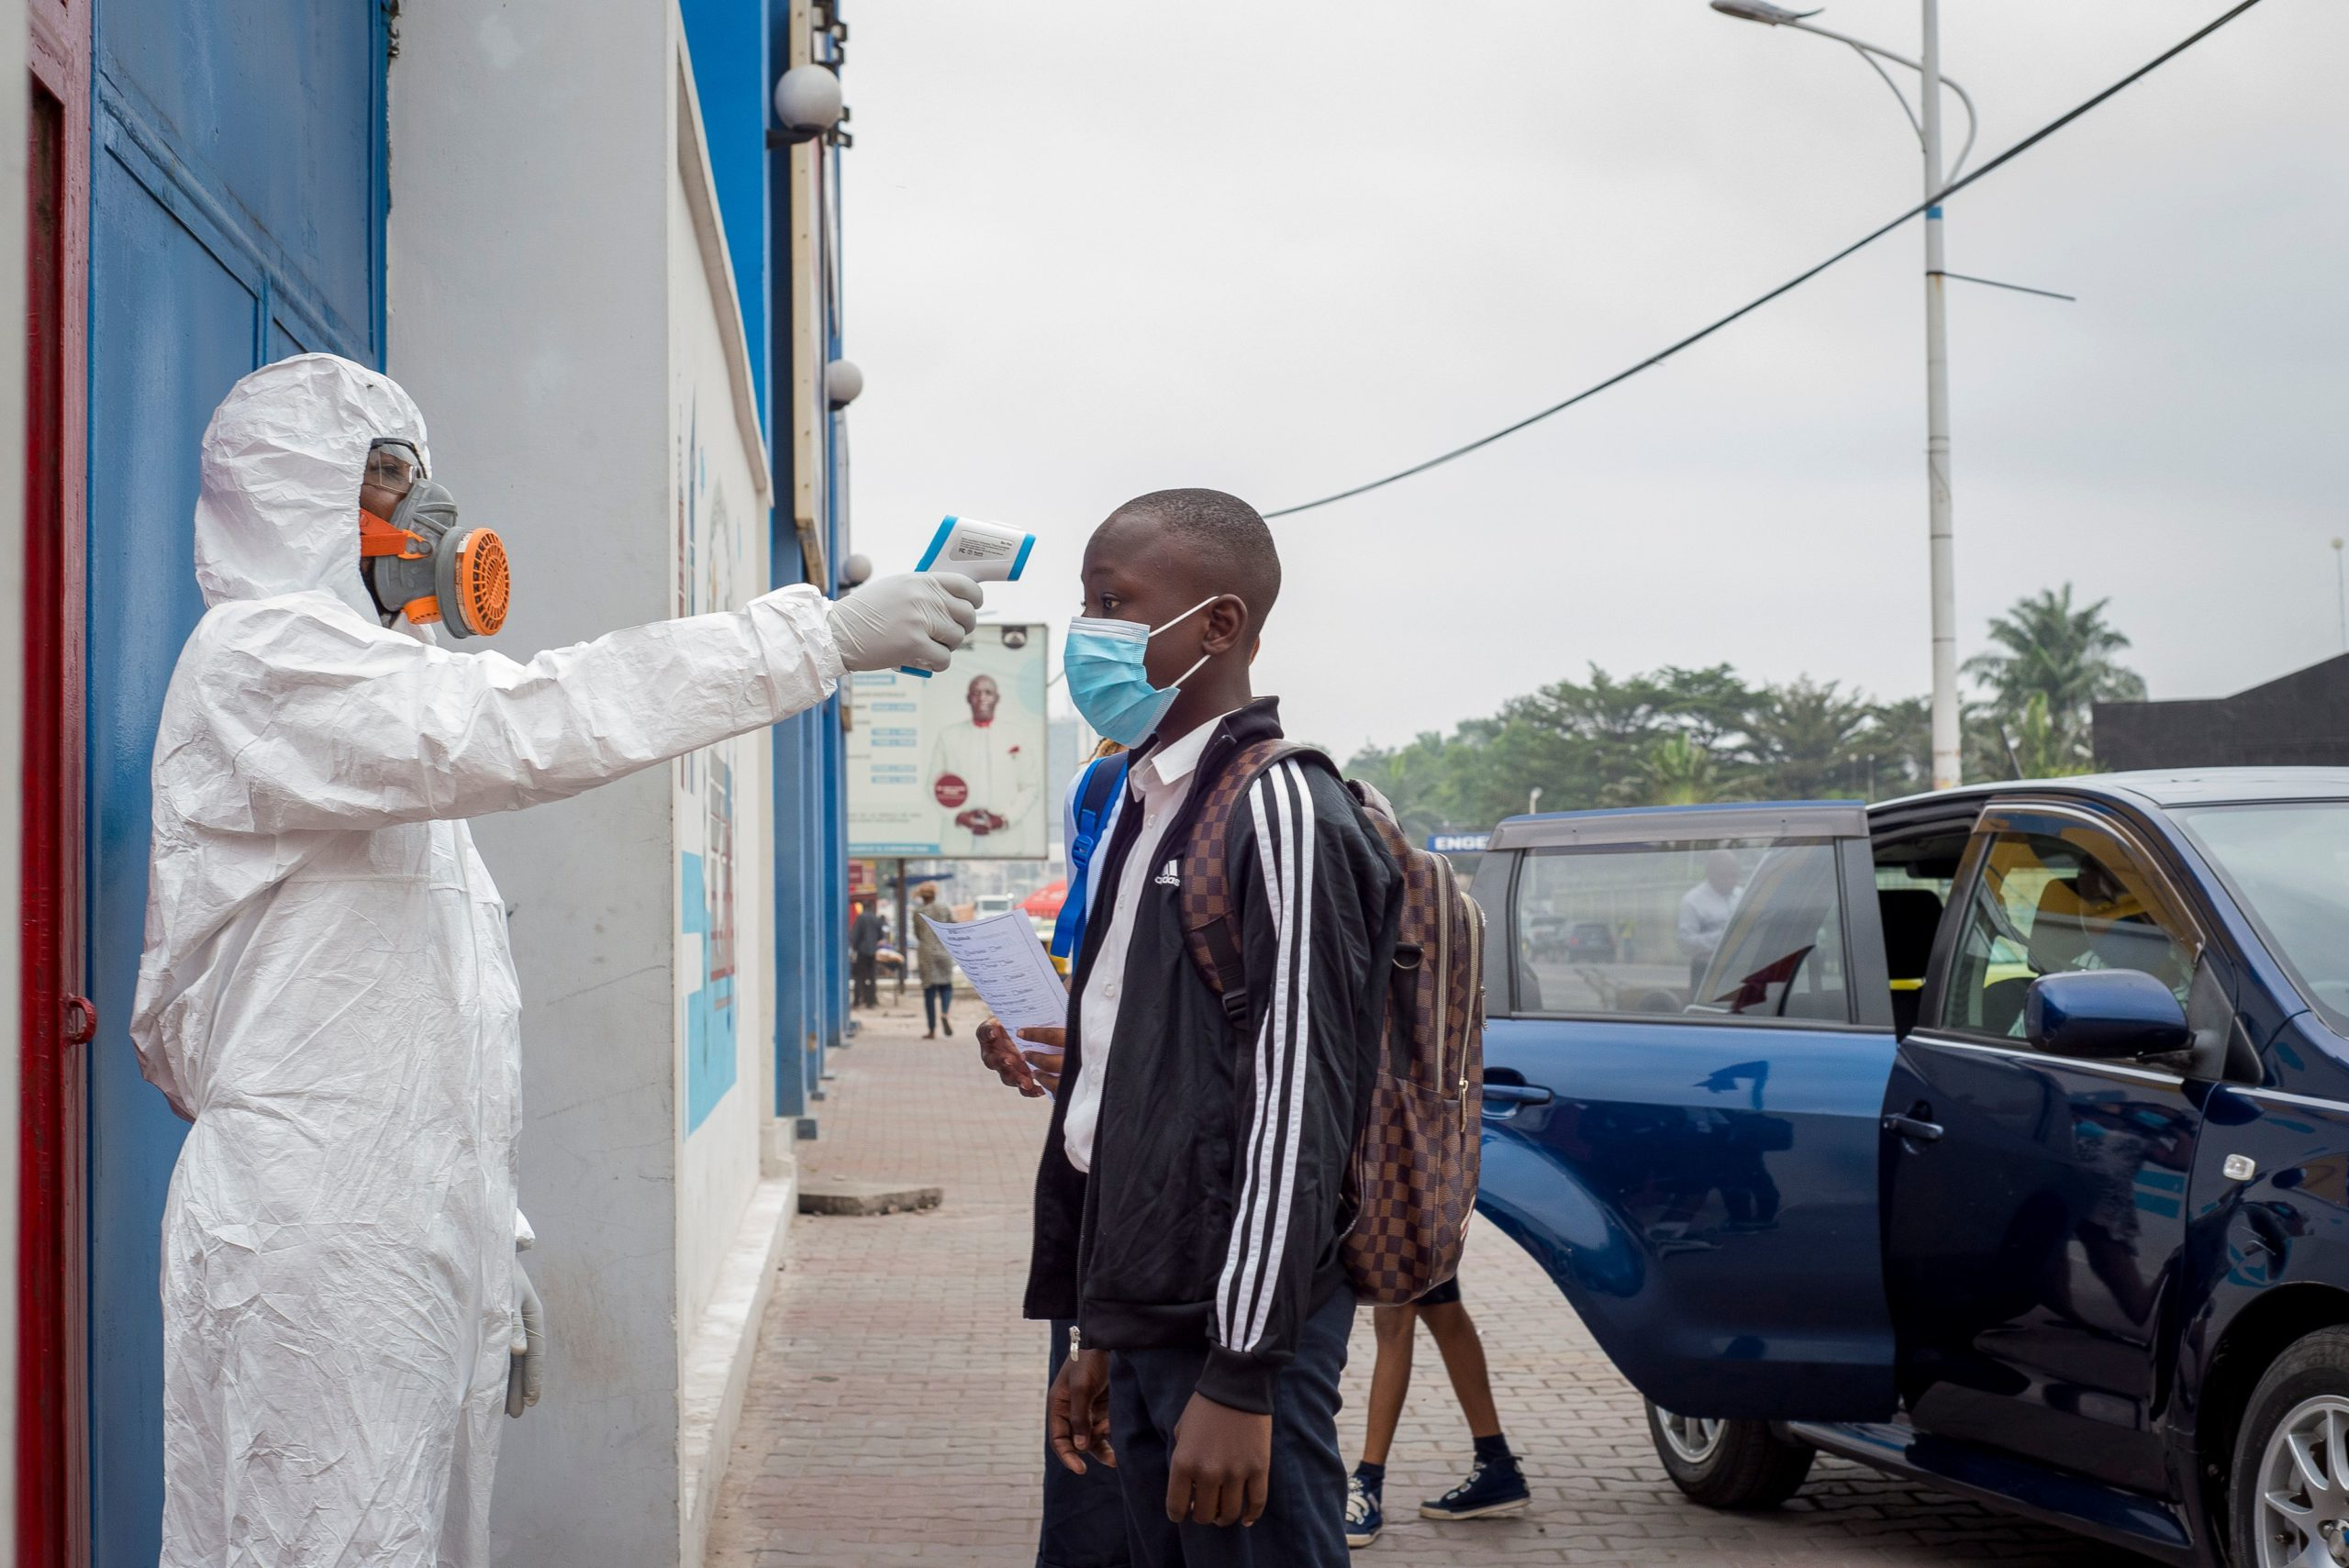 DRCONGO-HEALTH-VIRUS-EDUCATION